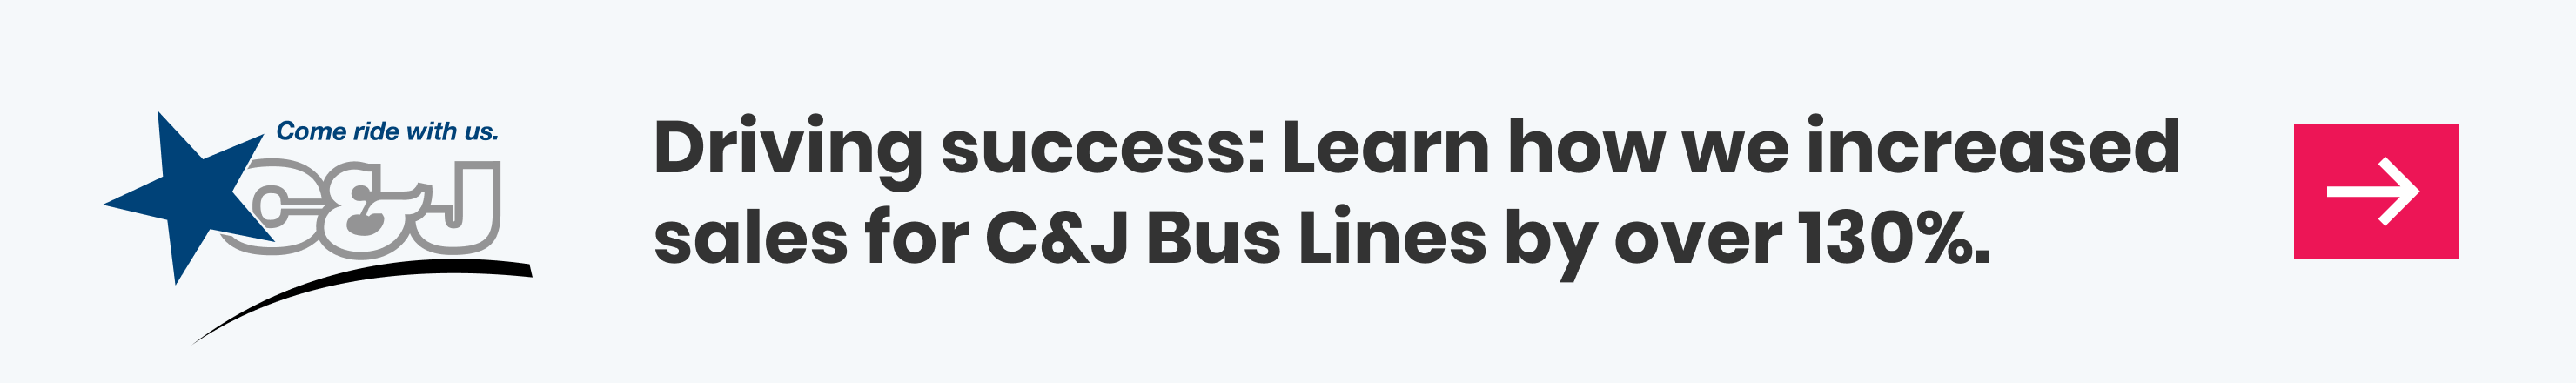 C&J case study inline